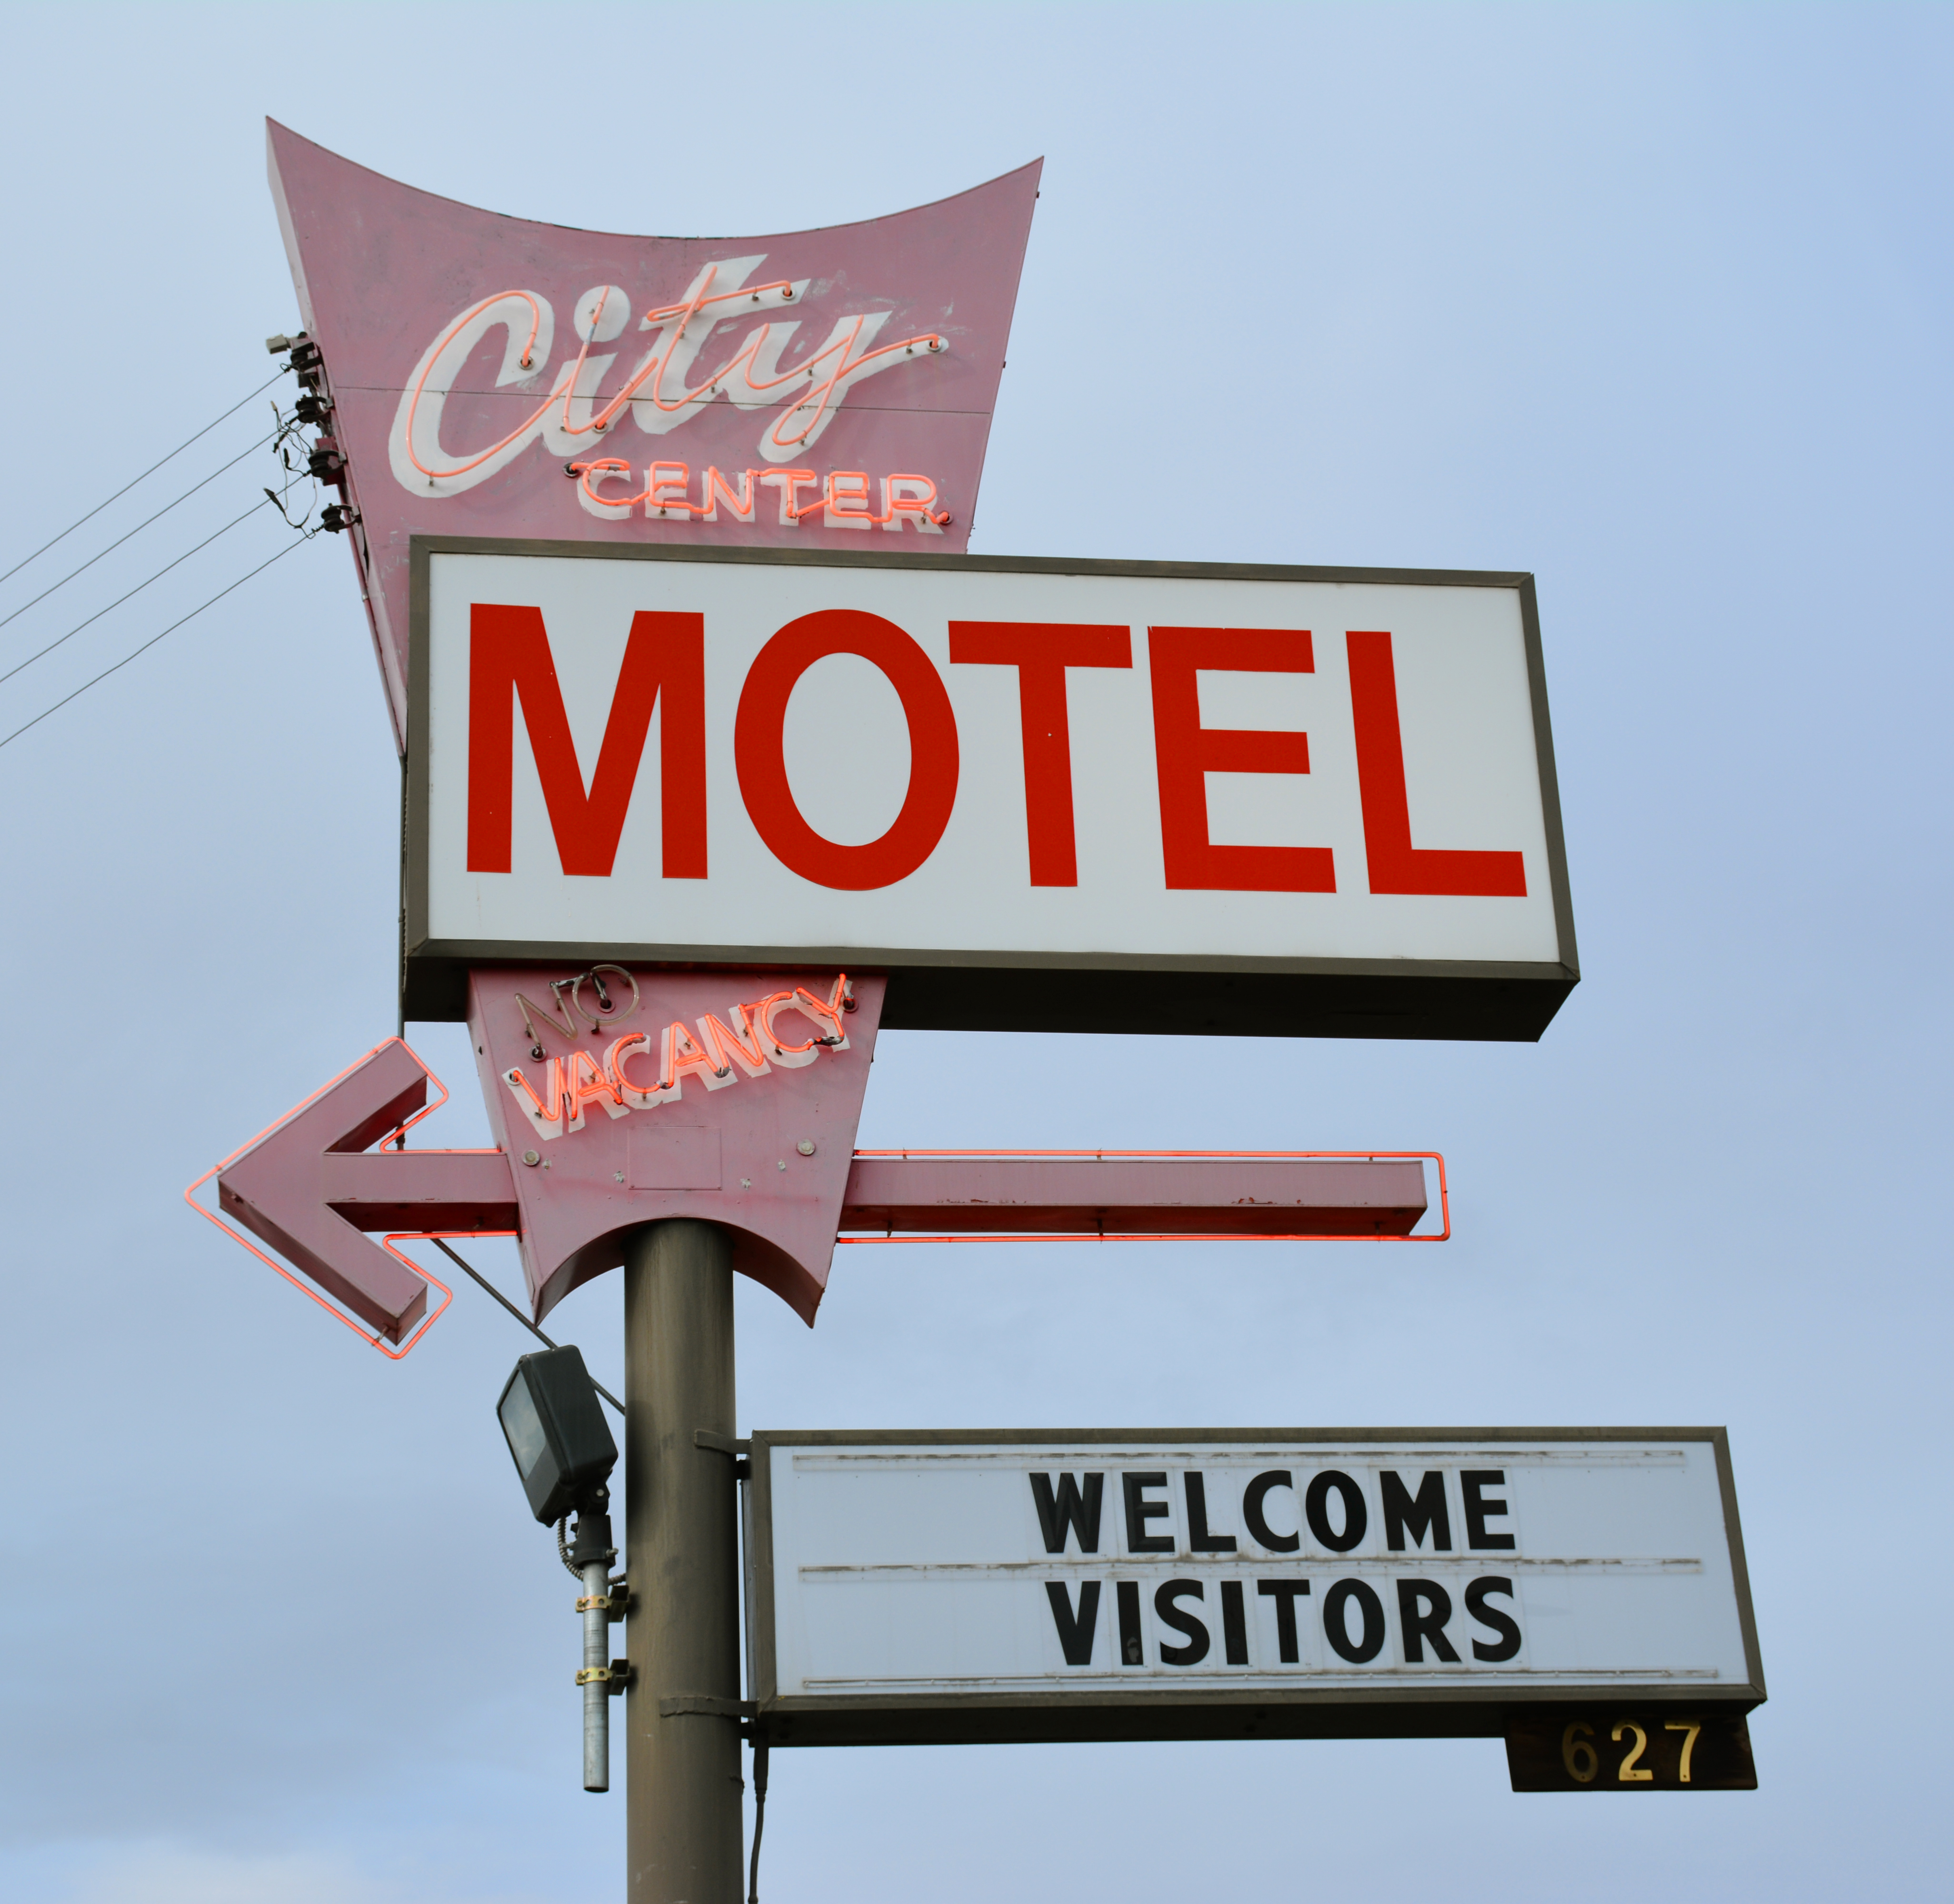 City Center Motel - 627 West Main Street, Walla Walla, Washington U.S.A. - March 22, 2019